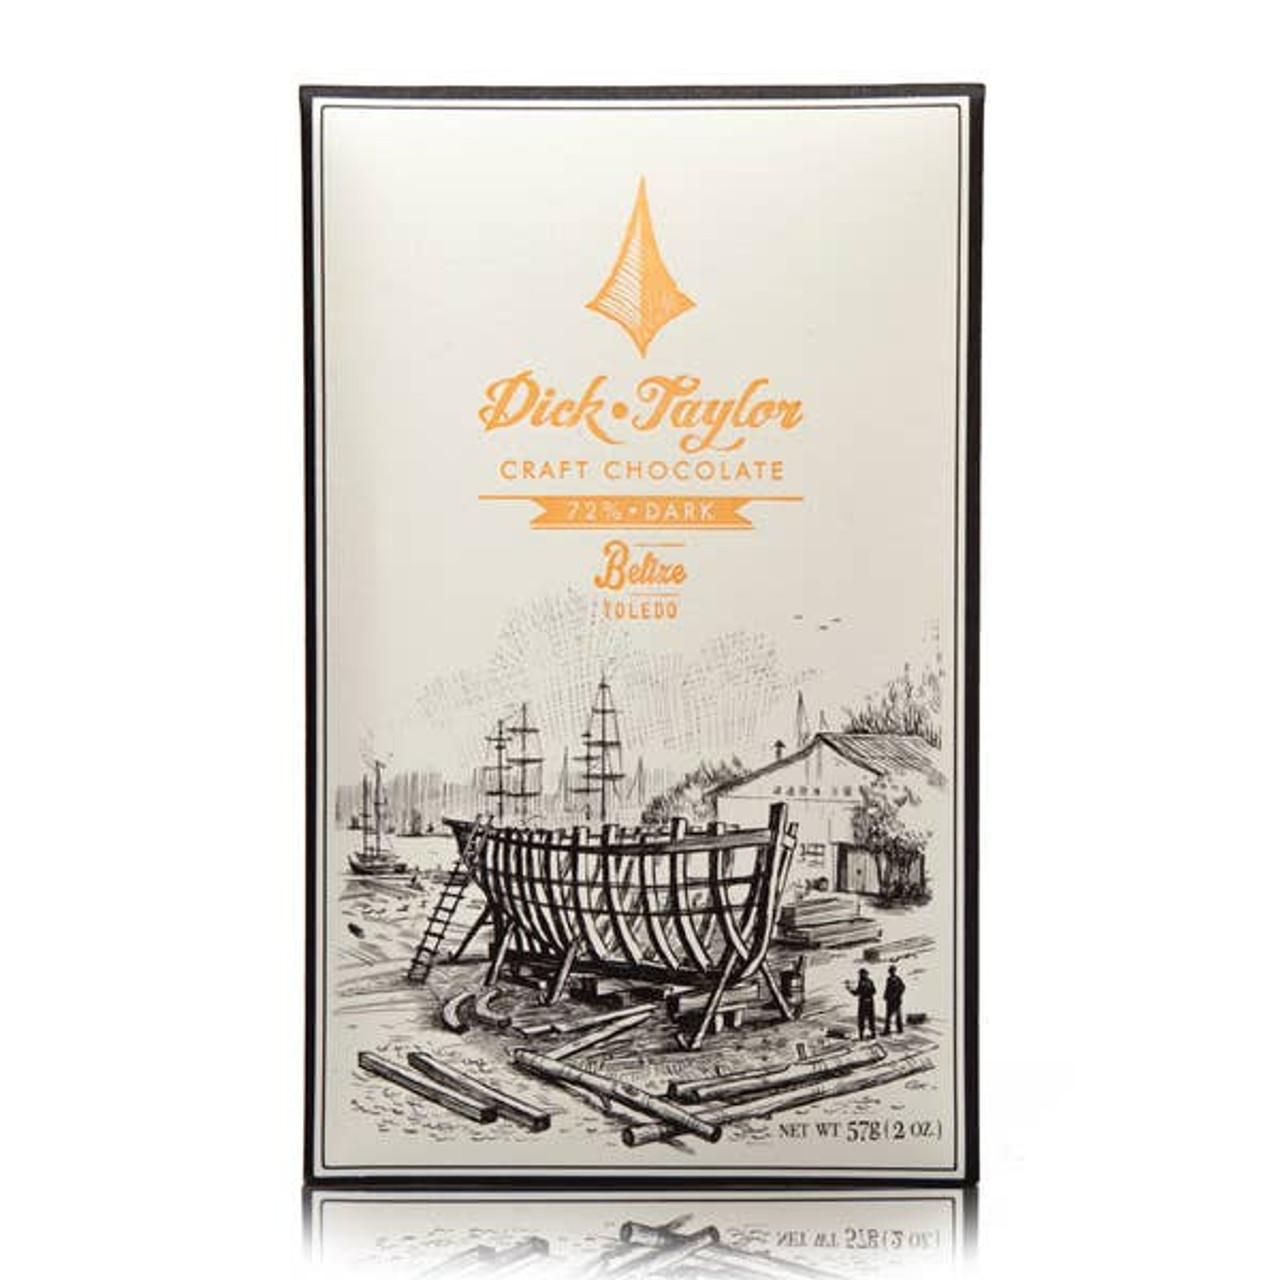 72% Belize Toledo Chocolate Dick Taylor Craft Chocolate